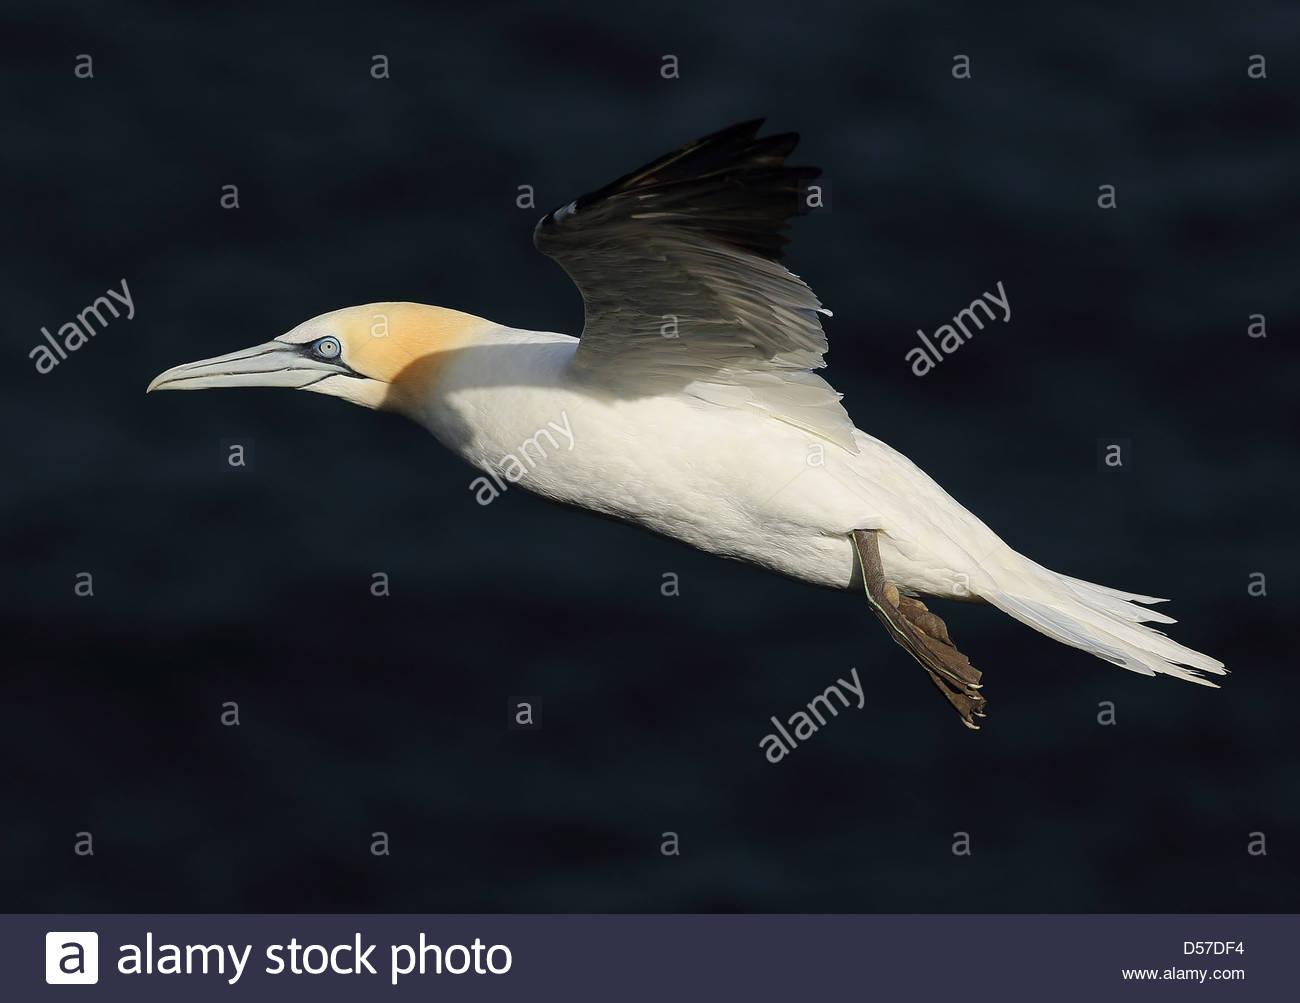 Northern Gannet in flight - Stock Image